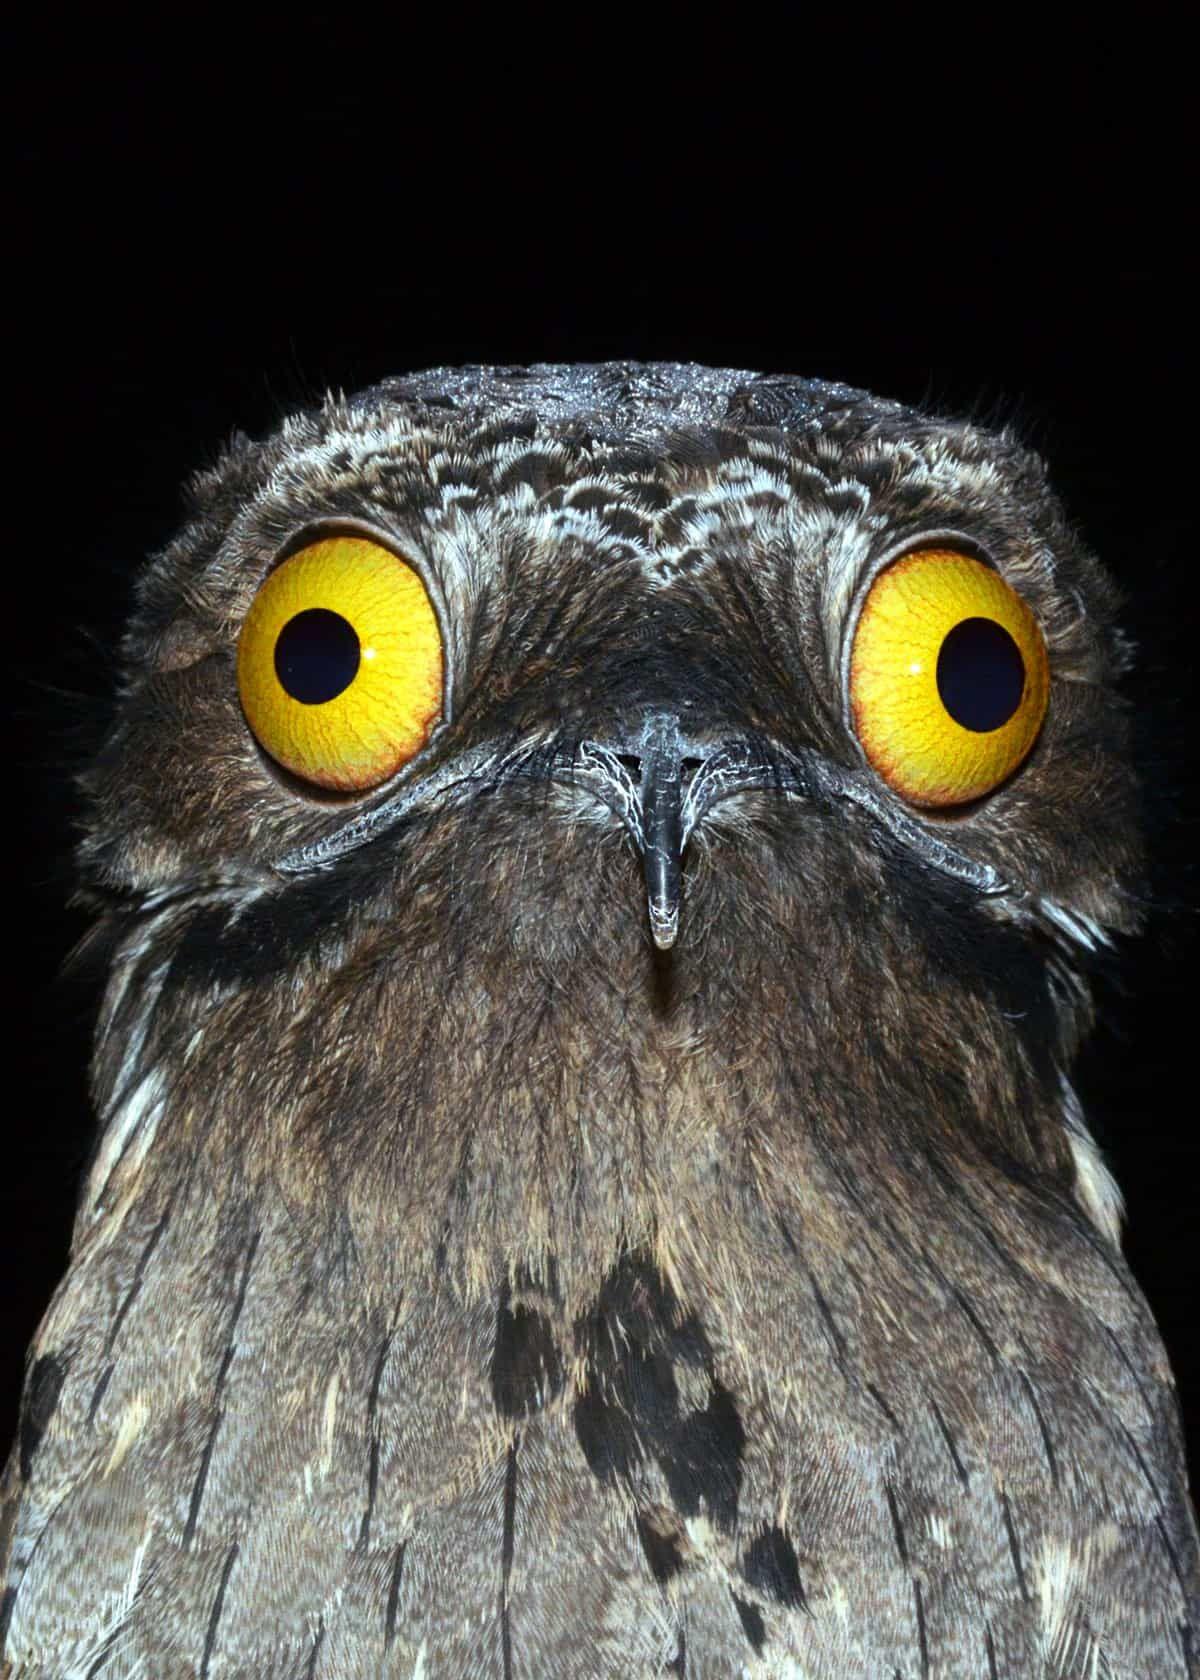 30 Potoo Facts: The Bird Behind the Meme (7 Potoo Species